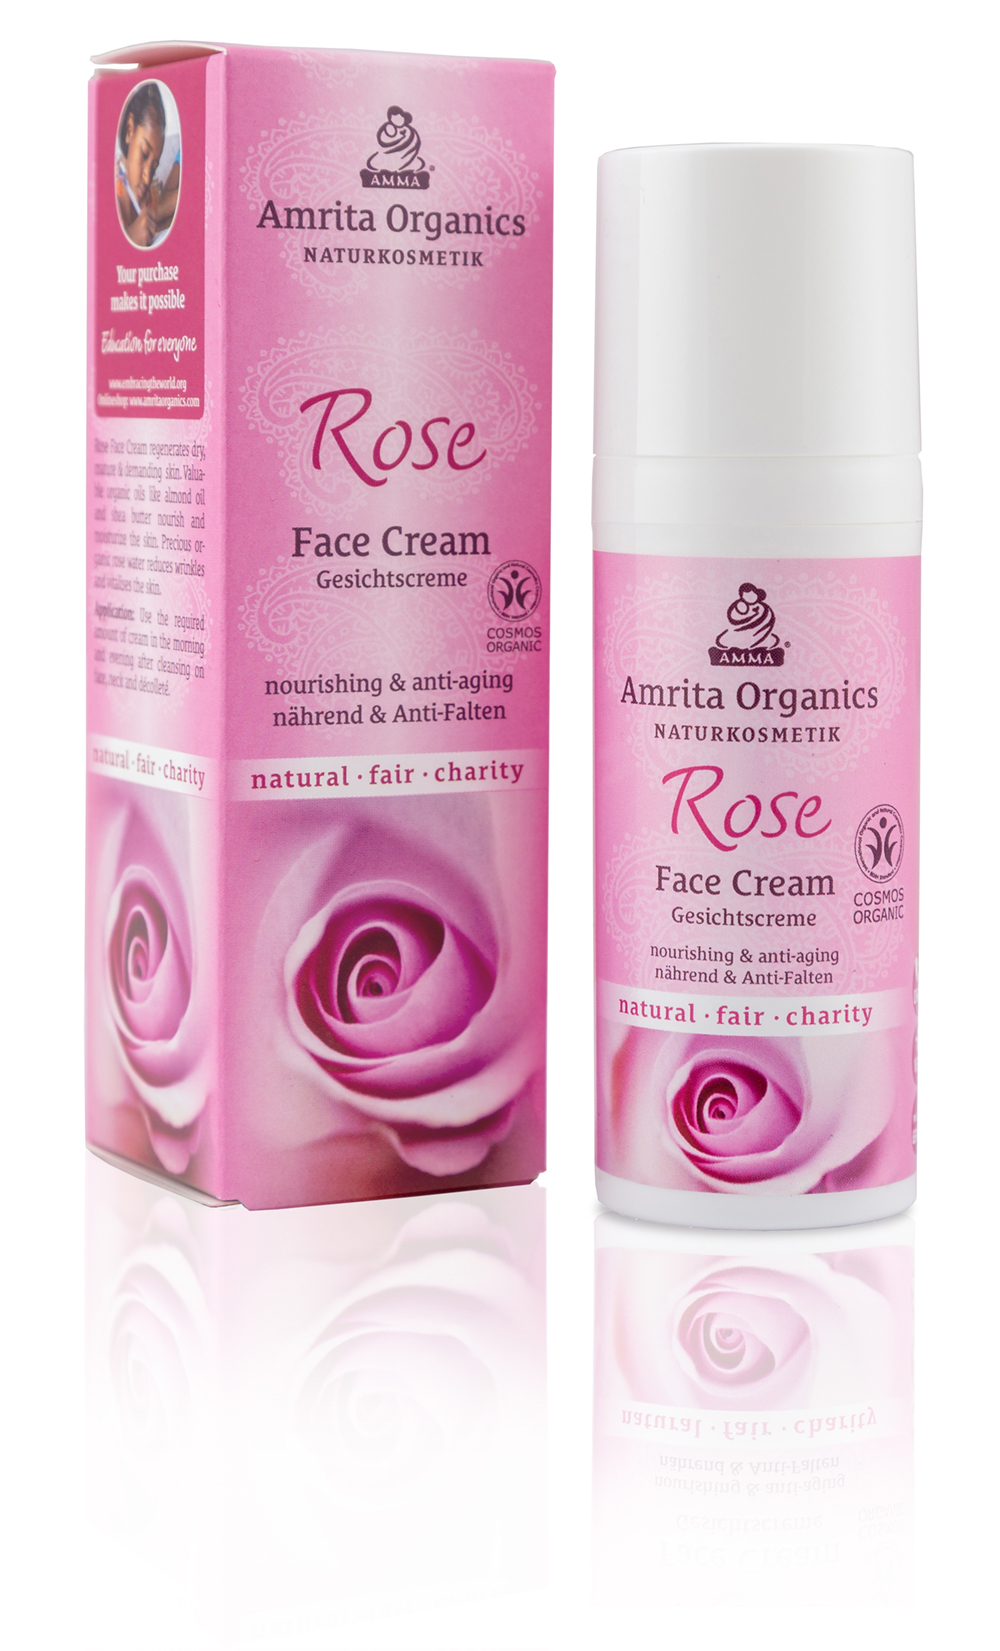 Rose Gesichtscreme